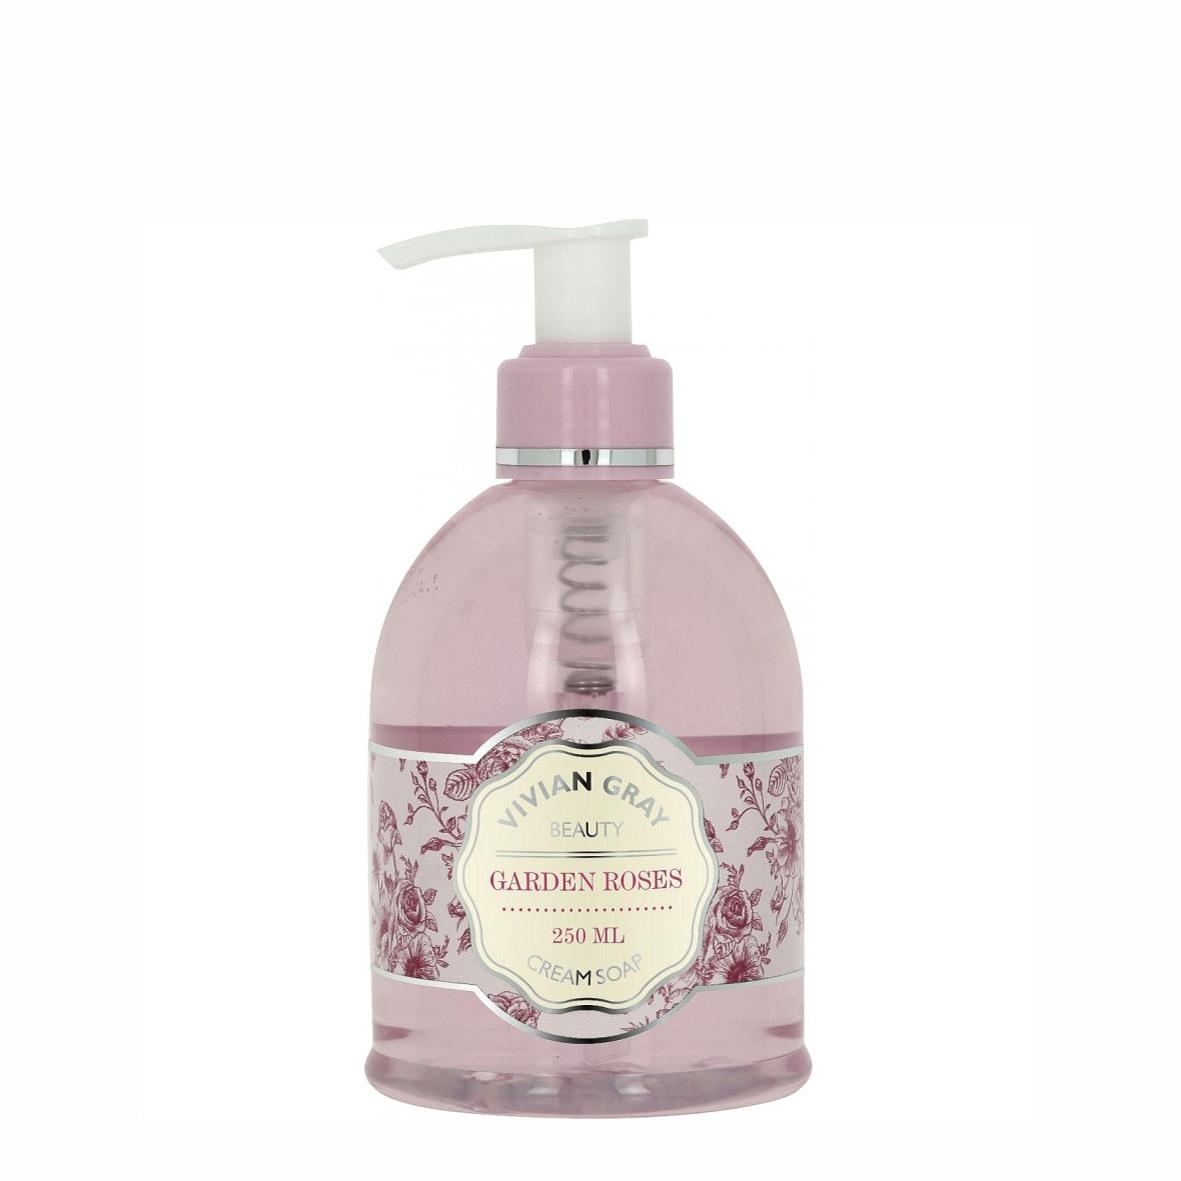 Tekuté mýdlo GARDEN ROSES - Vivian Gray, Provence - zvìtšit obrázek